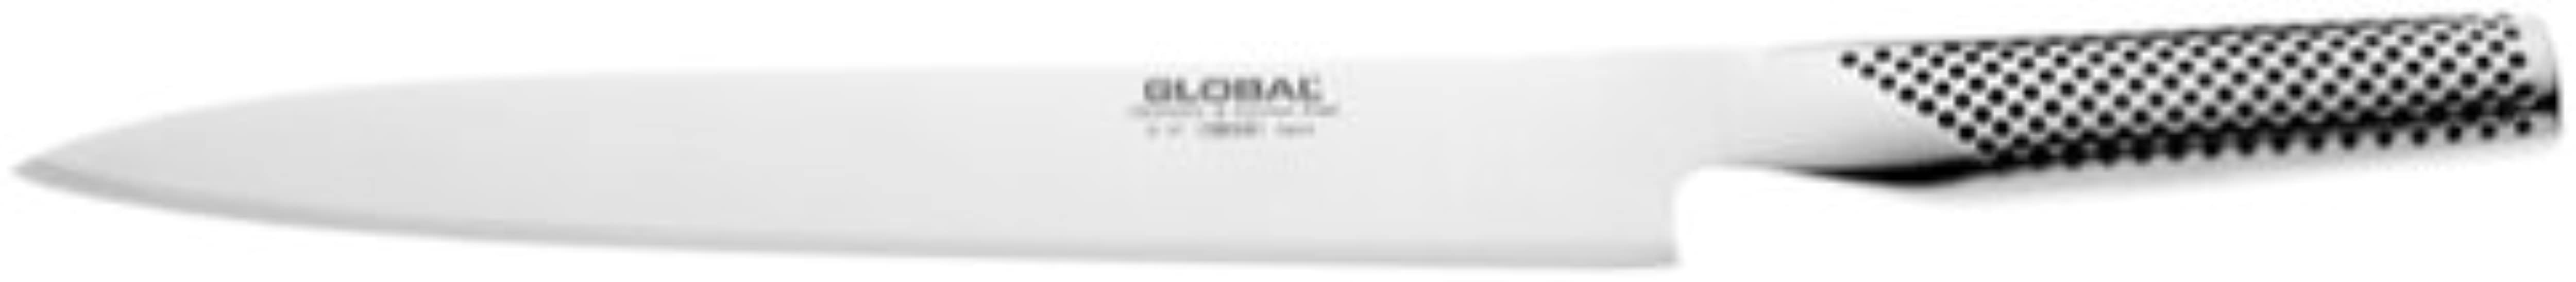 Global G 47 10 Inch 25cm Two Sided Sashimi YO Slicer G47